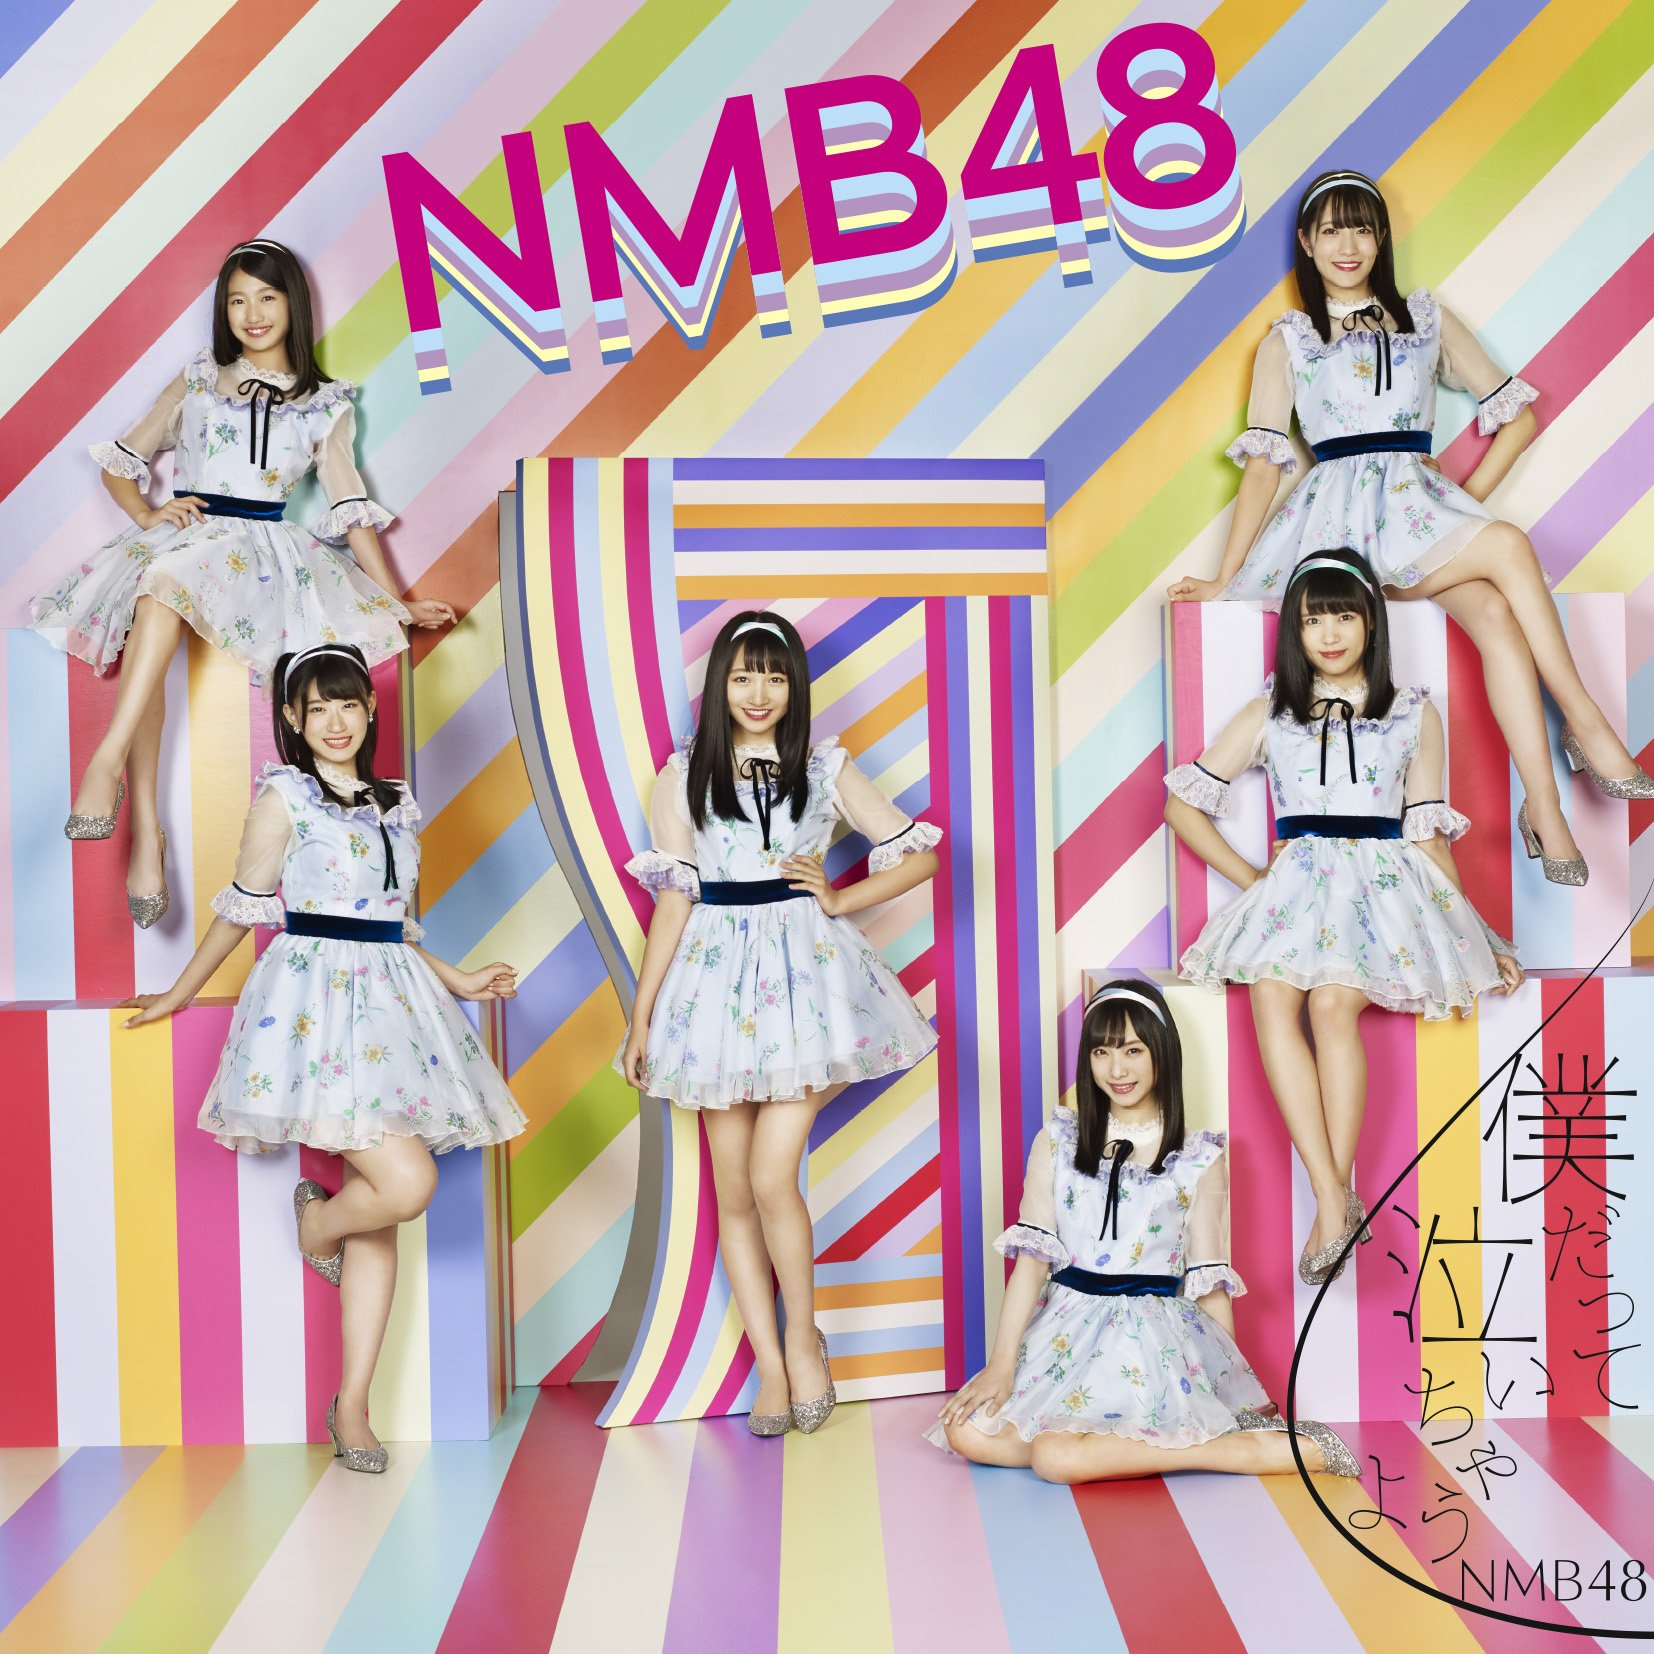 File:NMB48BokuDattenaichauyoRegD.jpg